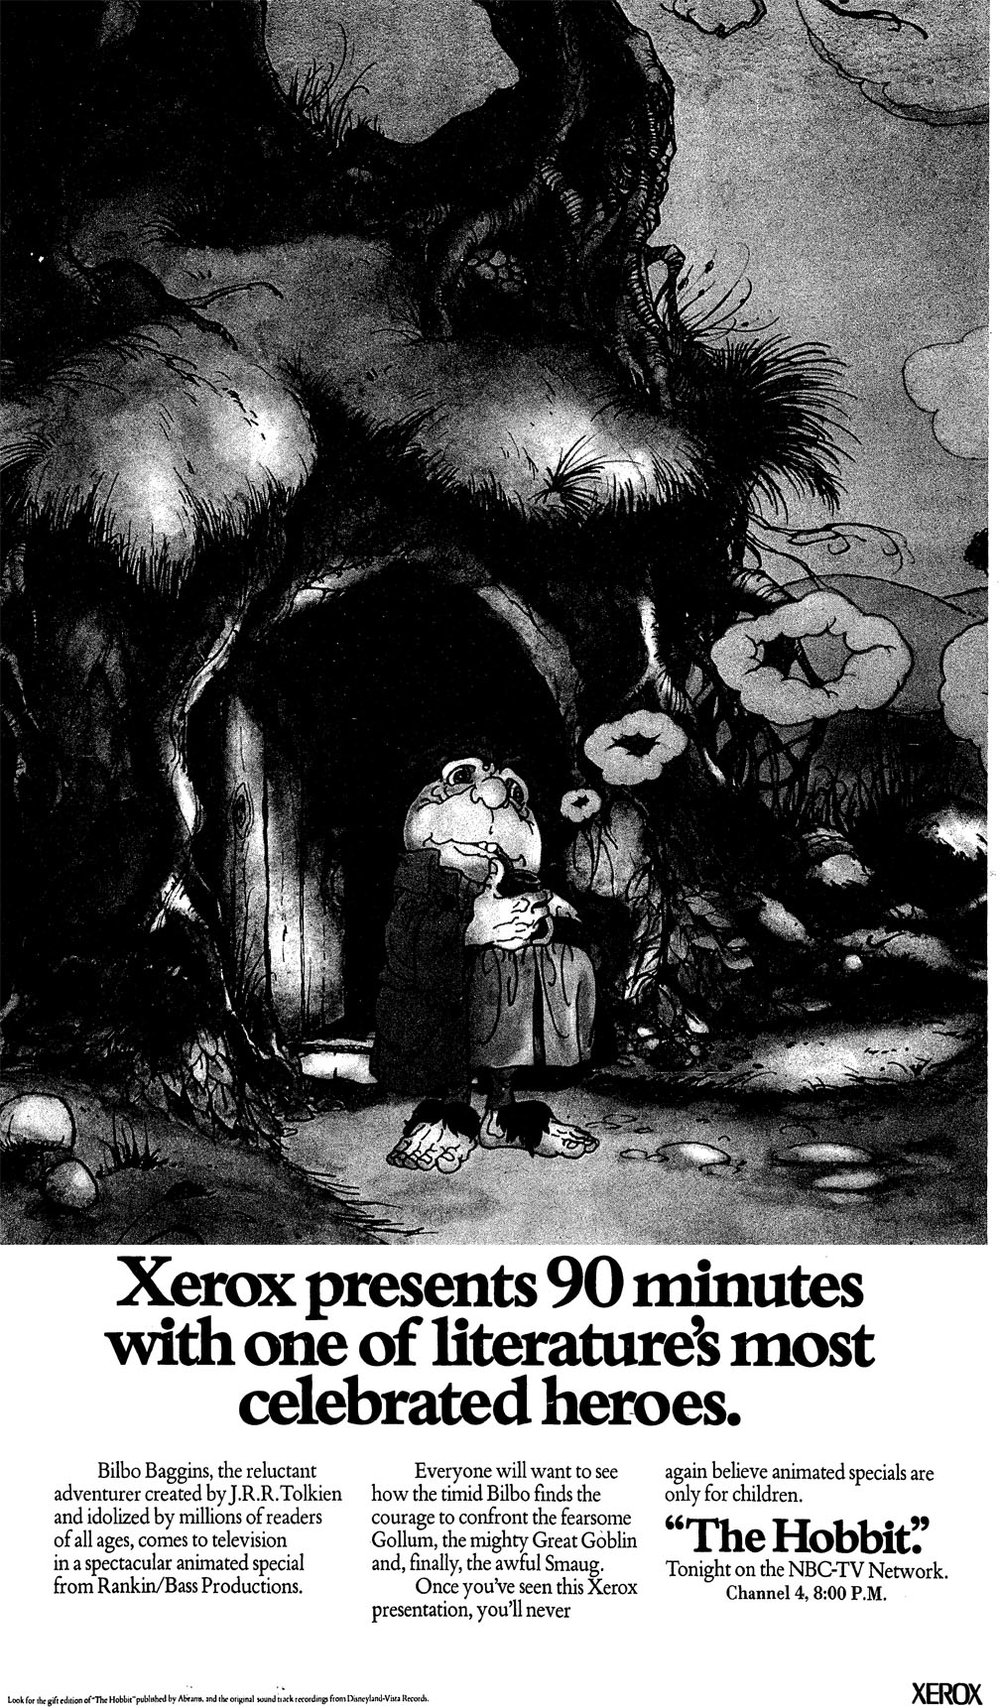 Xerox_Hobbit_fullimage.jpg